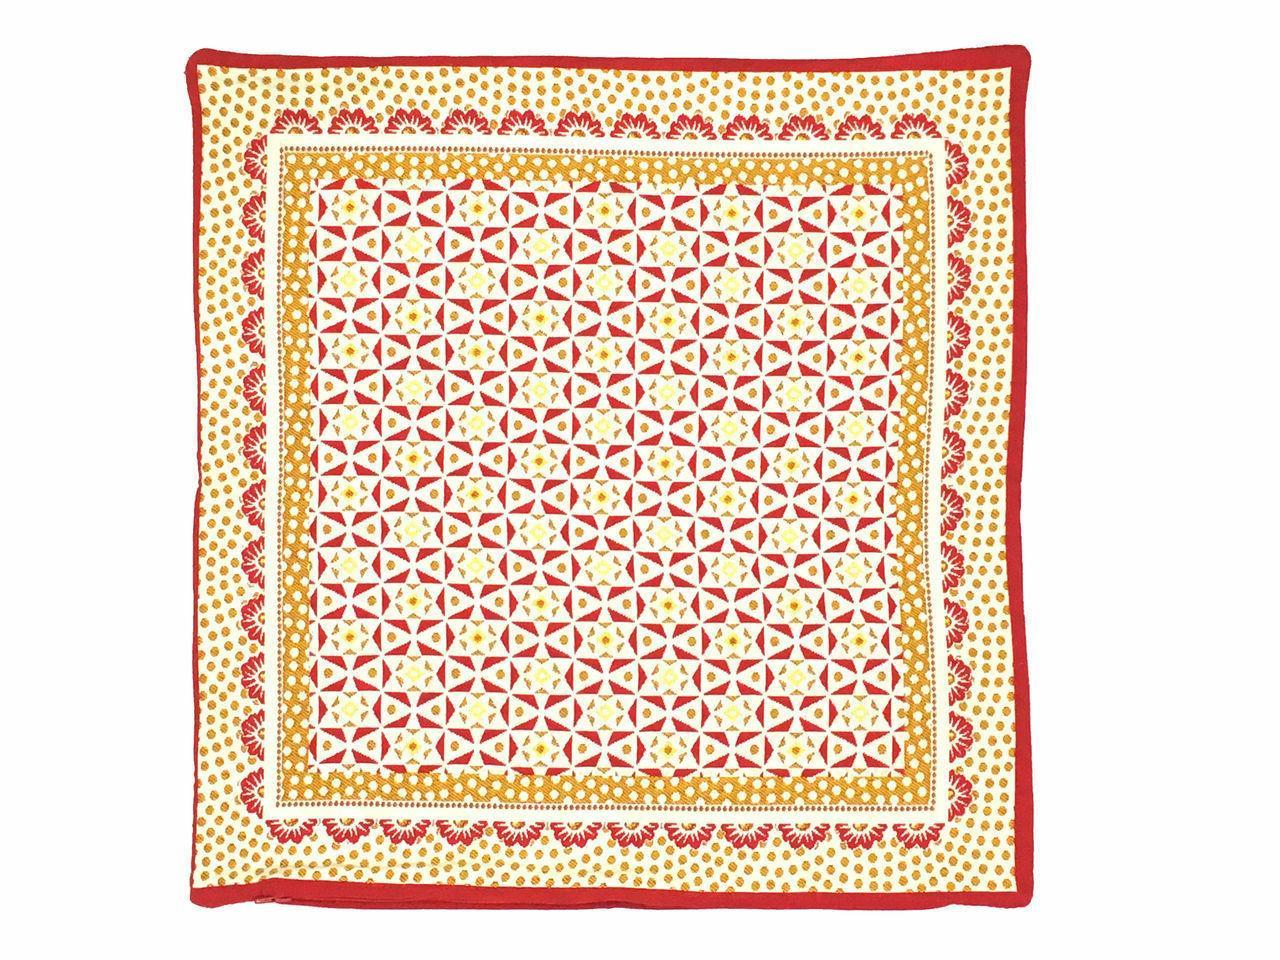 Pillow Cover Spring Butterflies 18x18 Made France